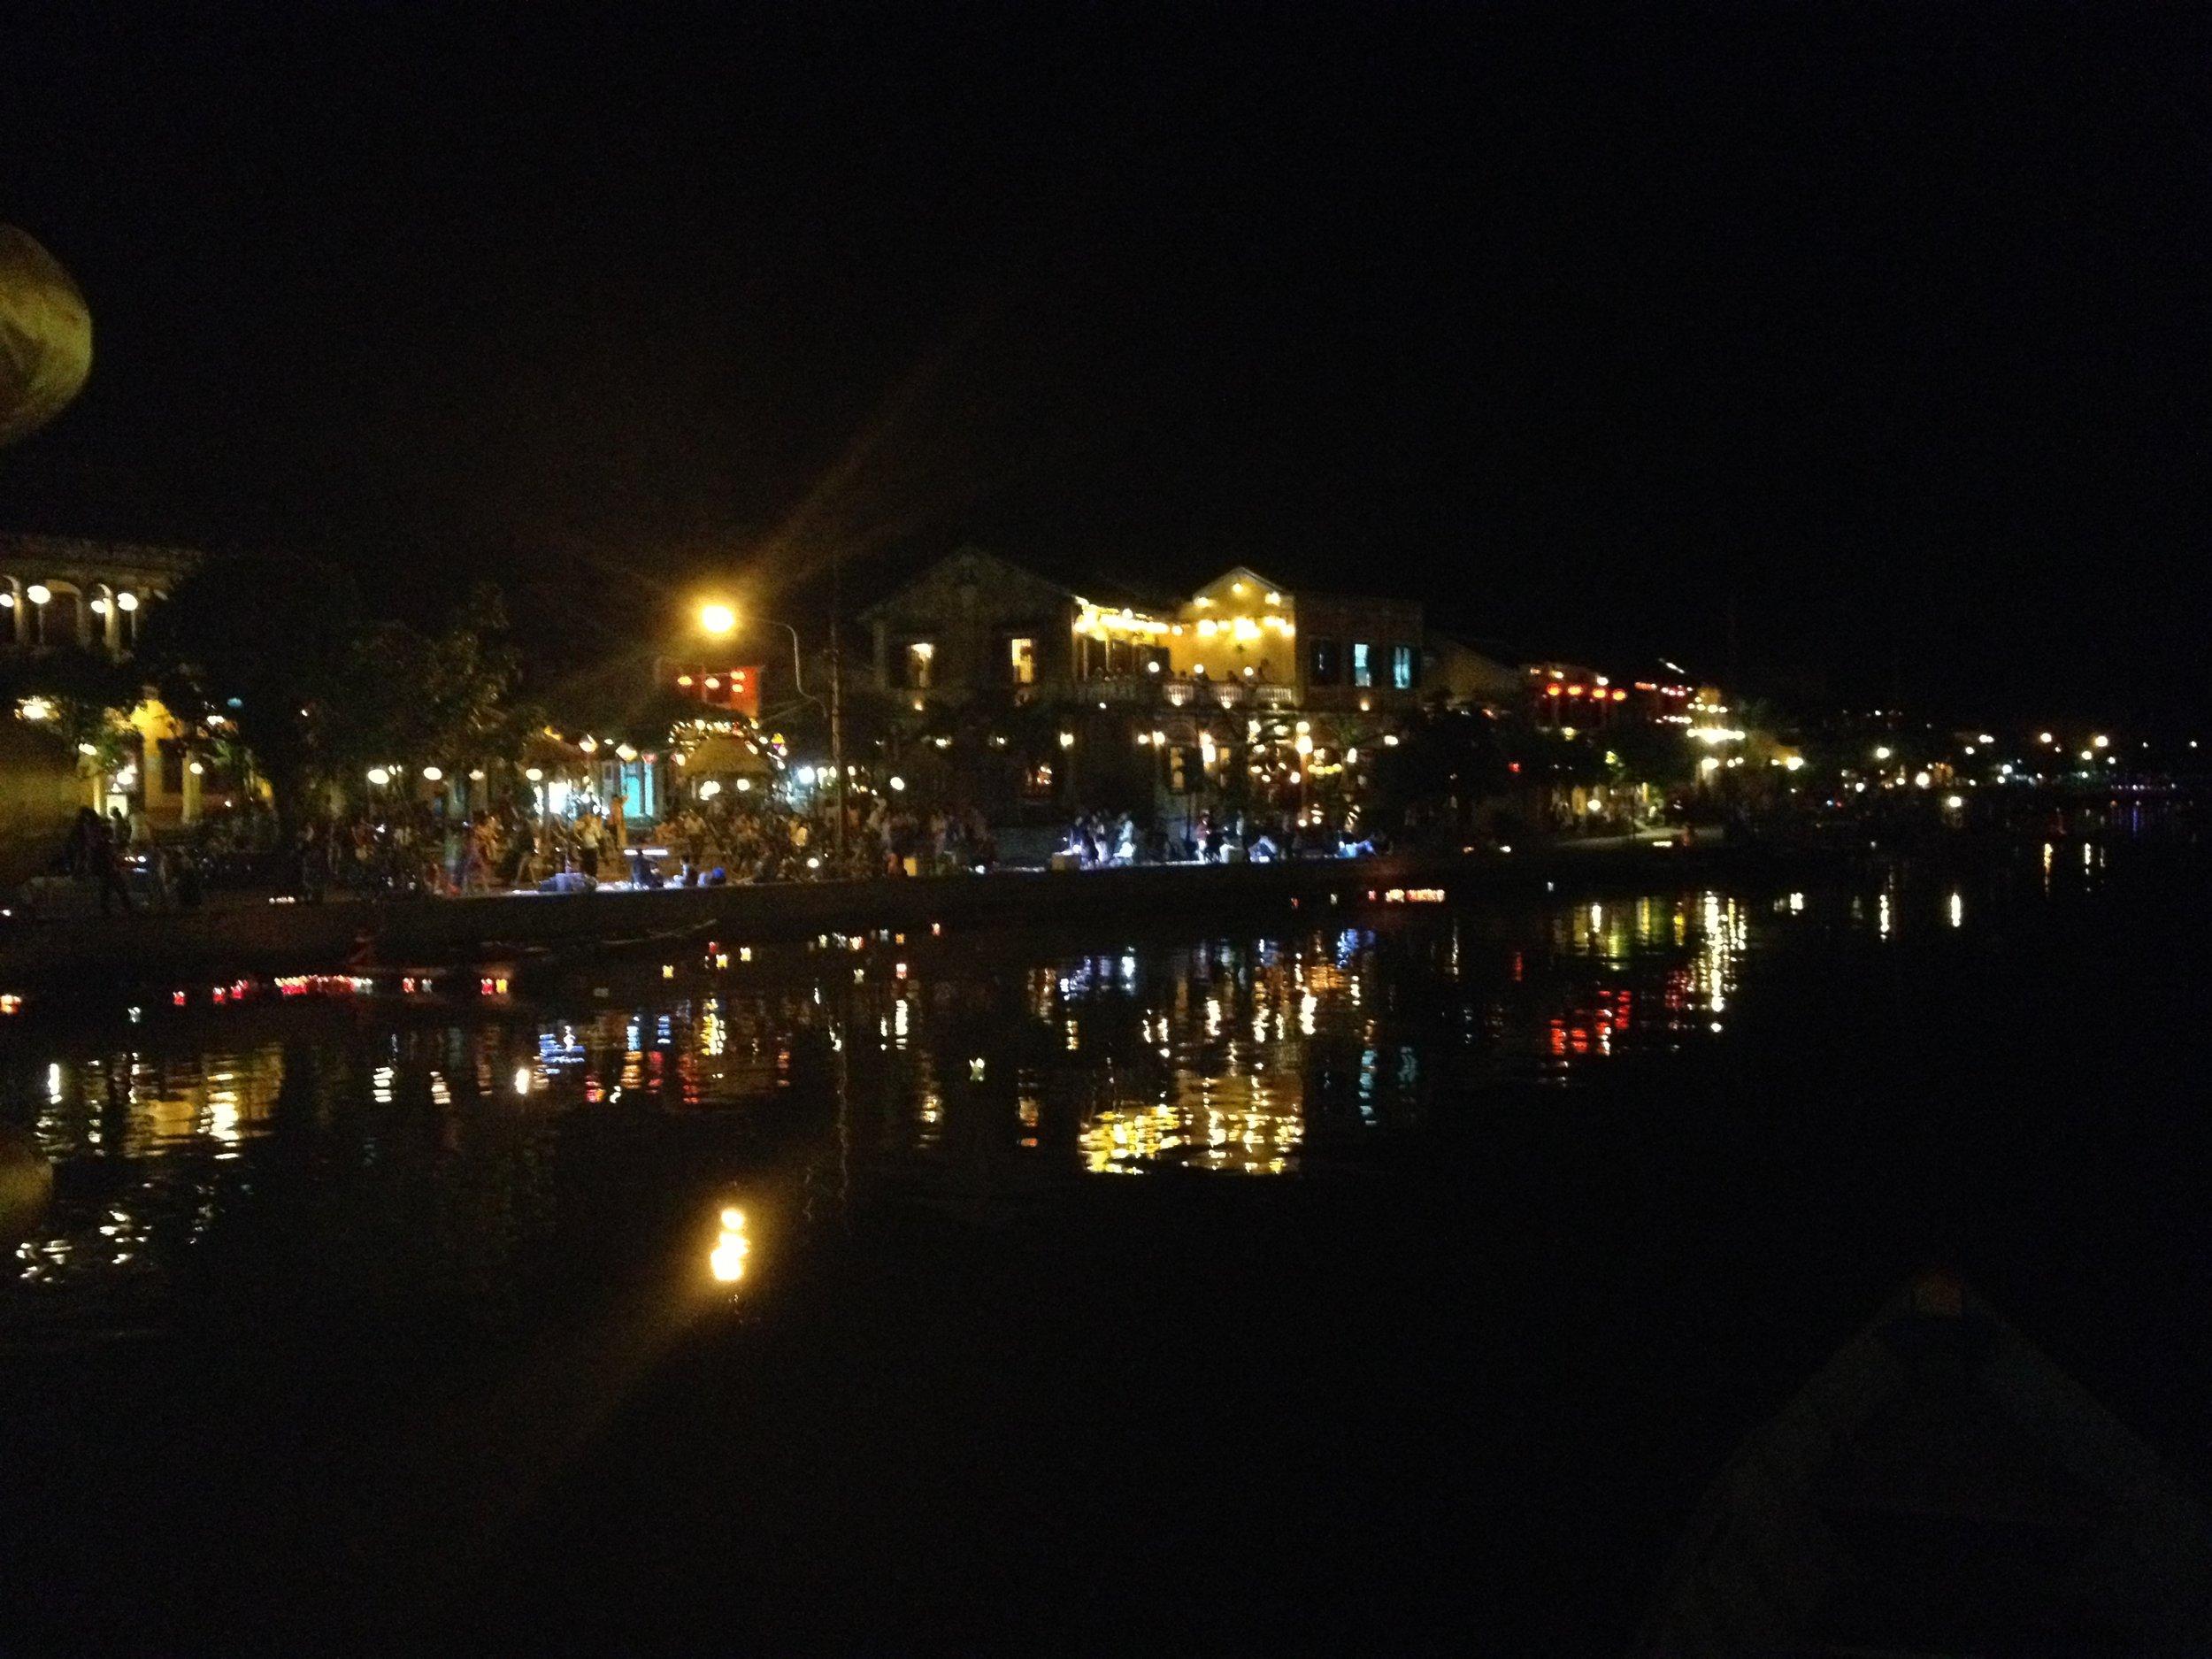 Water reflection in Hoi An, Vietnam